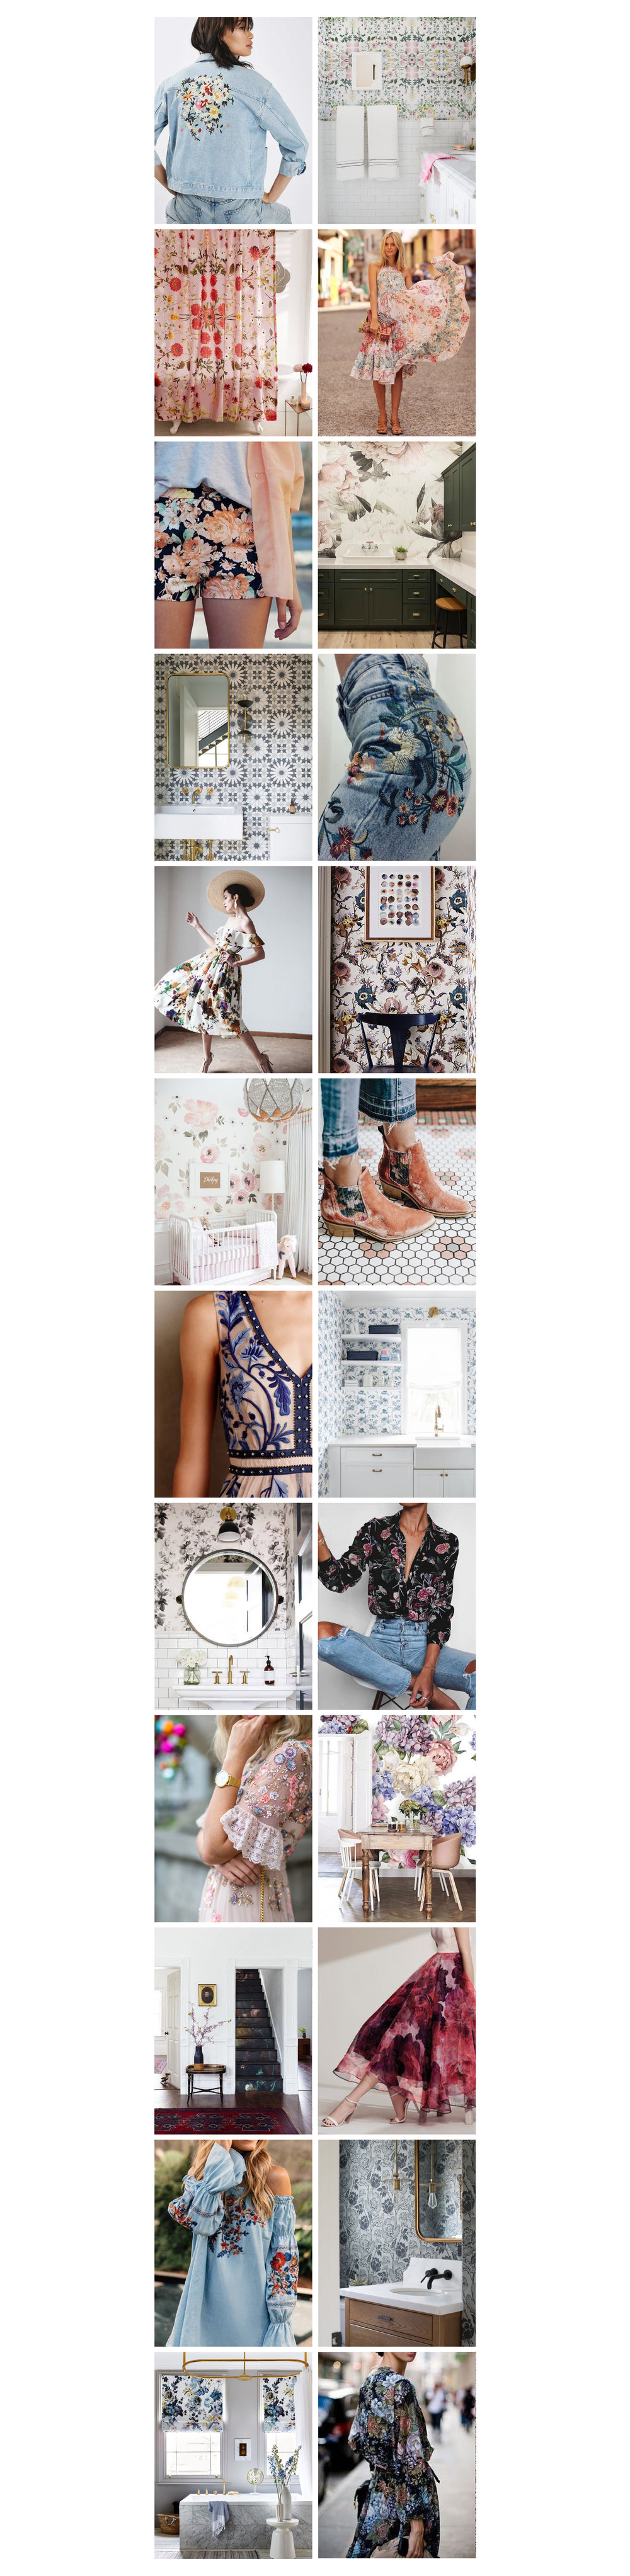 kris and kate studio_fashion vs. interiors_floral